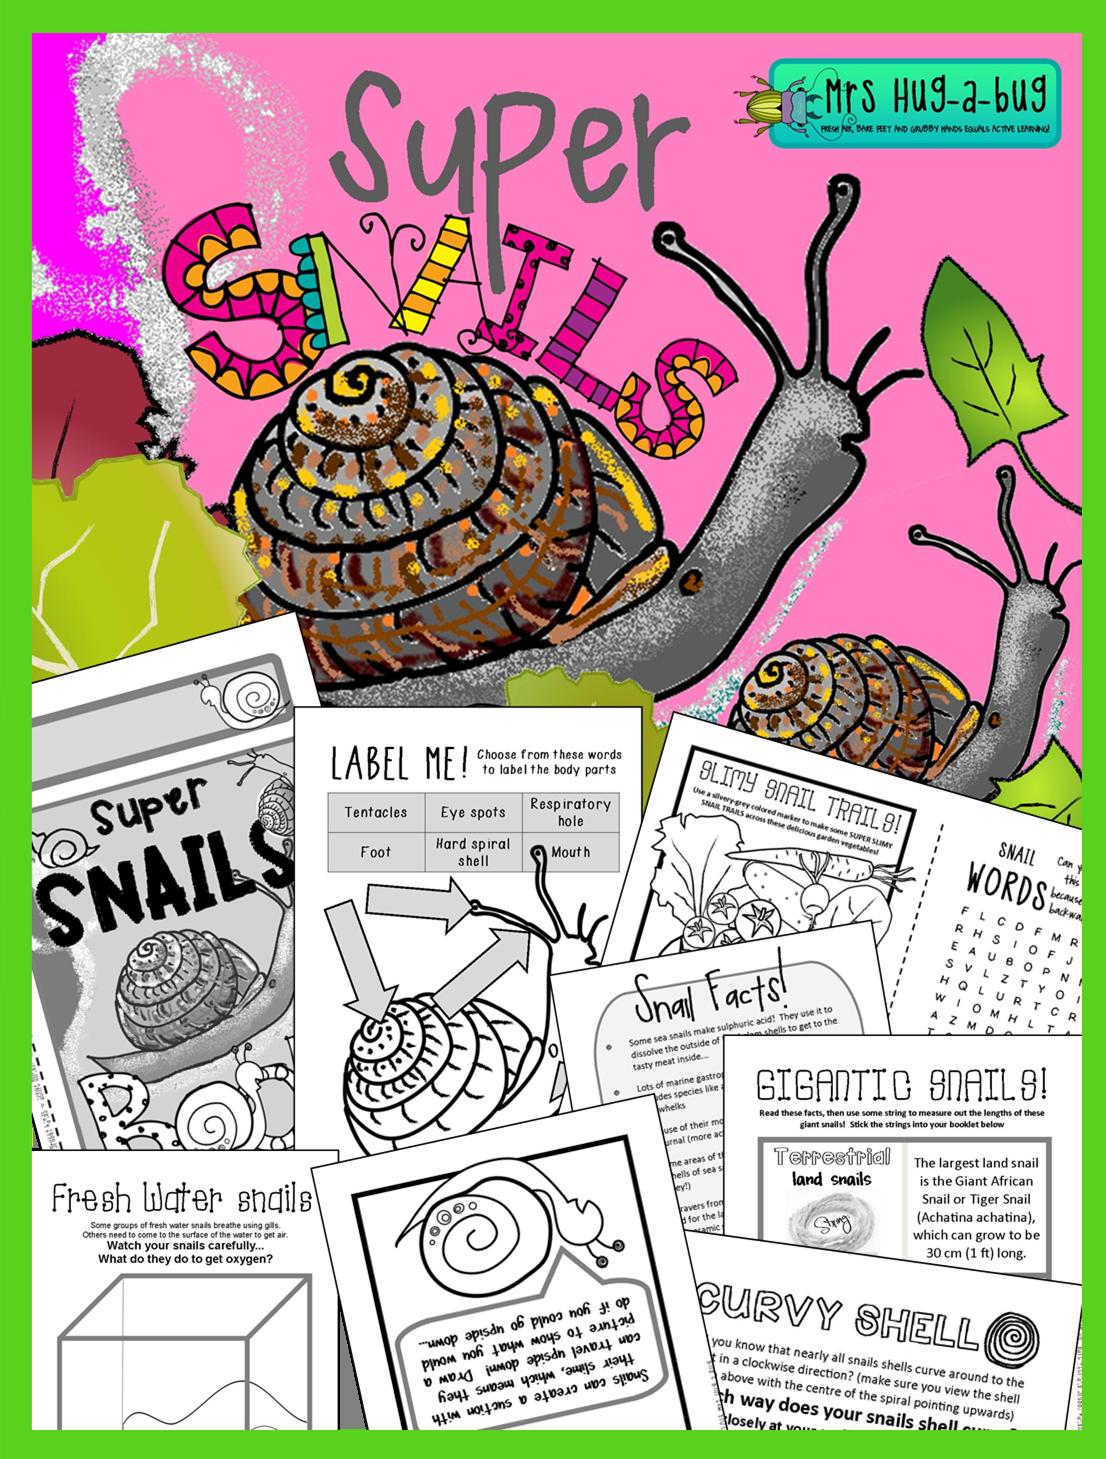 Snails Fun Amp Facts About Terrestrial Amp Aquatic Snails